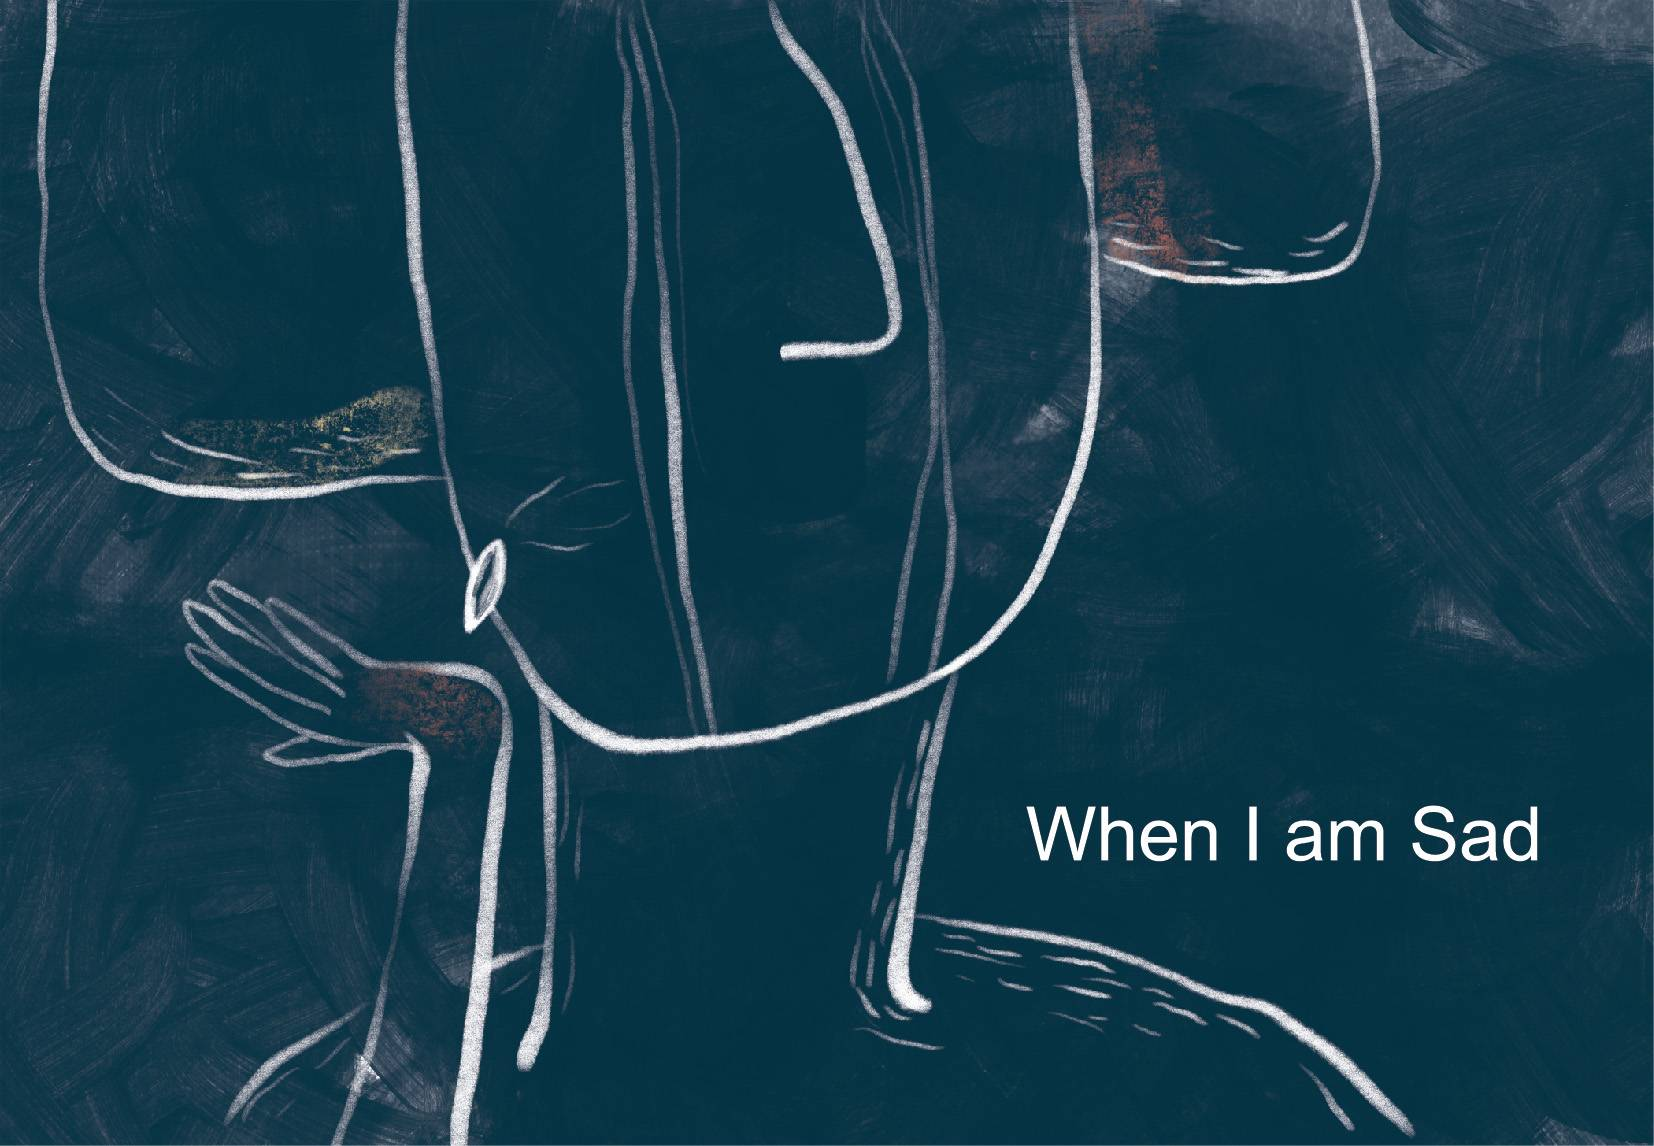 WHEN I AM SAD by Lilit Altunyan